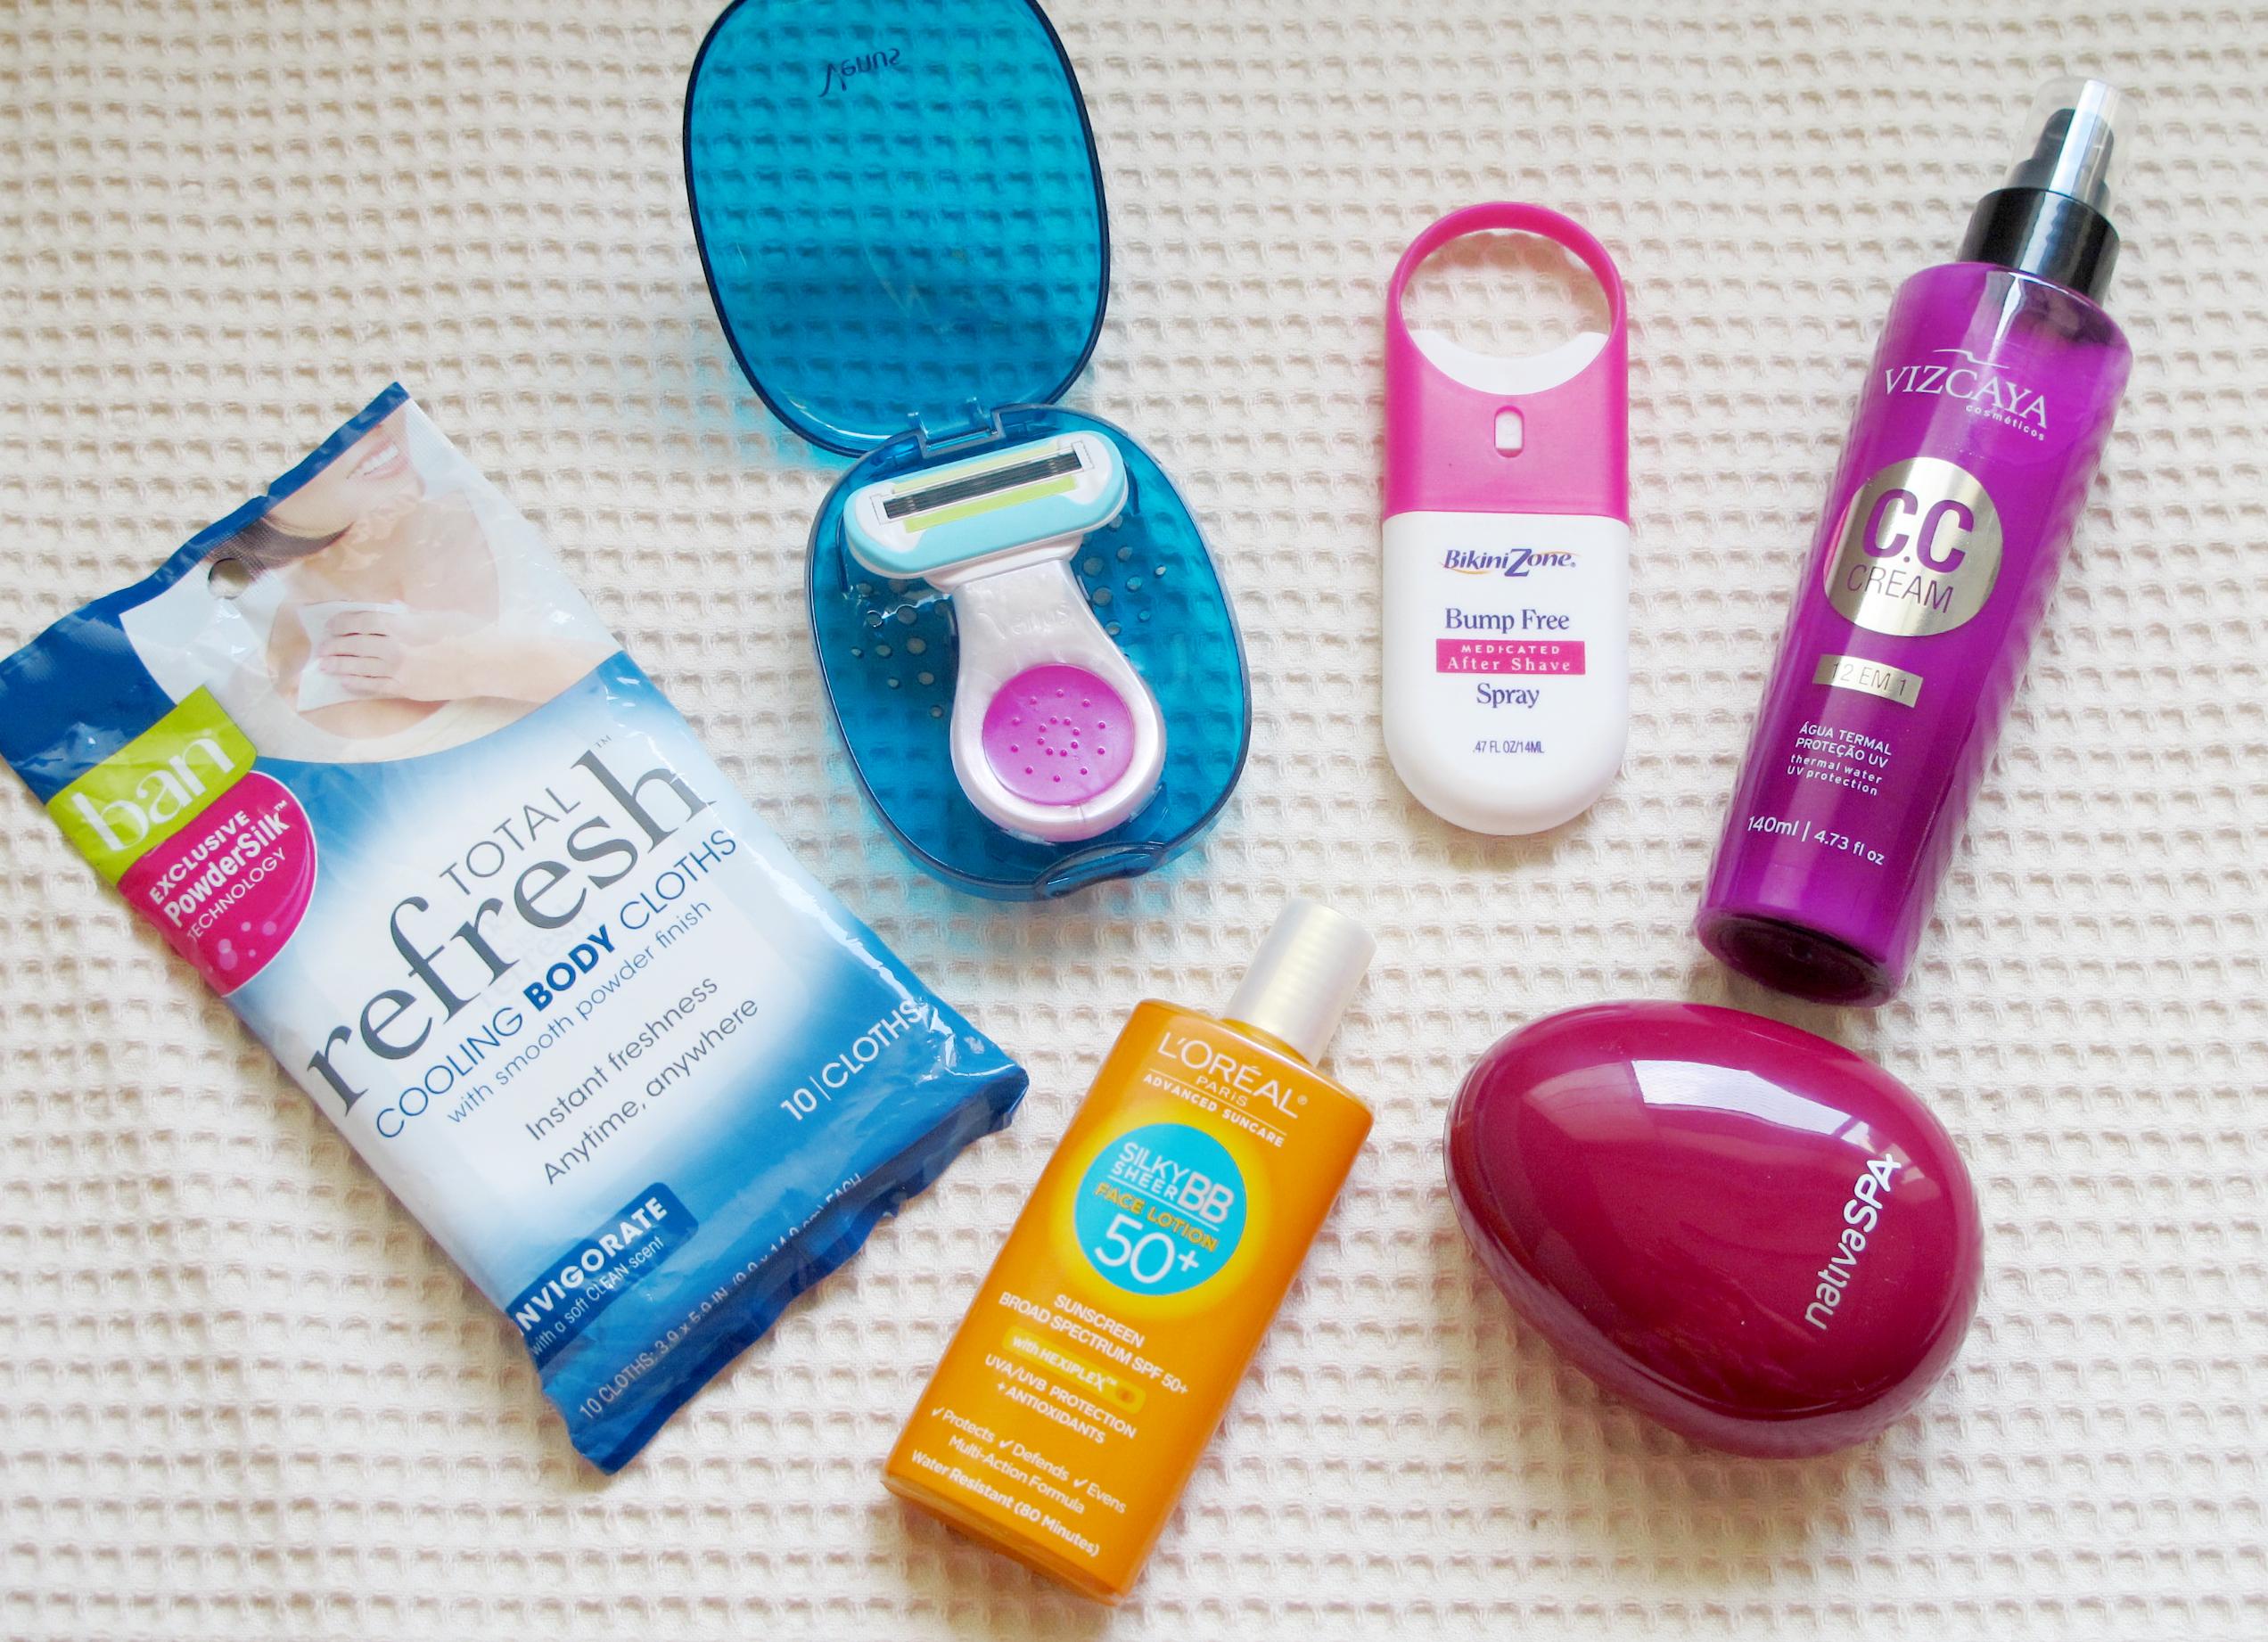 produtos-diferentes-legais-praia-verao-venus-bikini-zone-cc-cream-cabelo-pele-viscaya-nativa-spa-bb-50-loreal-ban-total-refresh-beleza-blog-dica